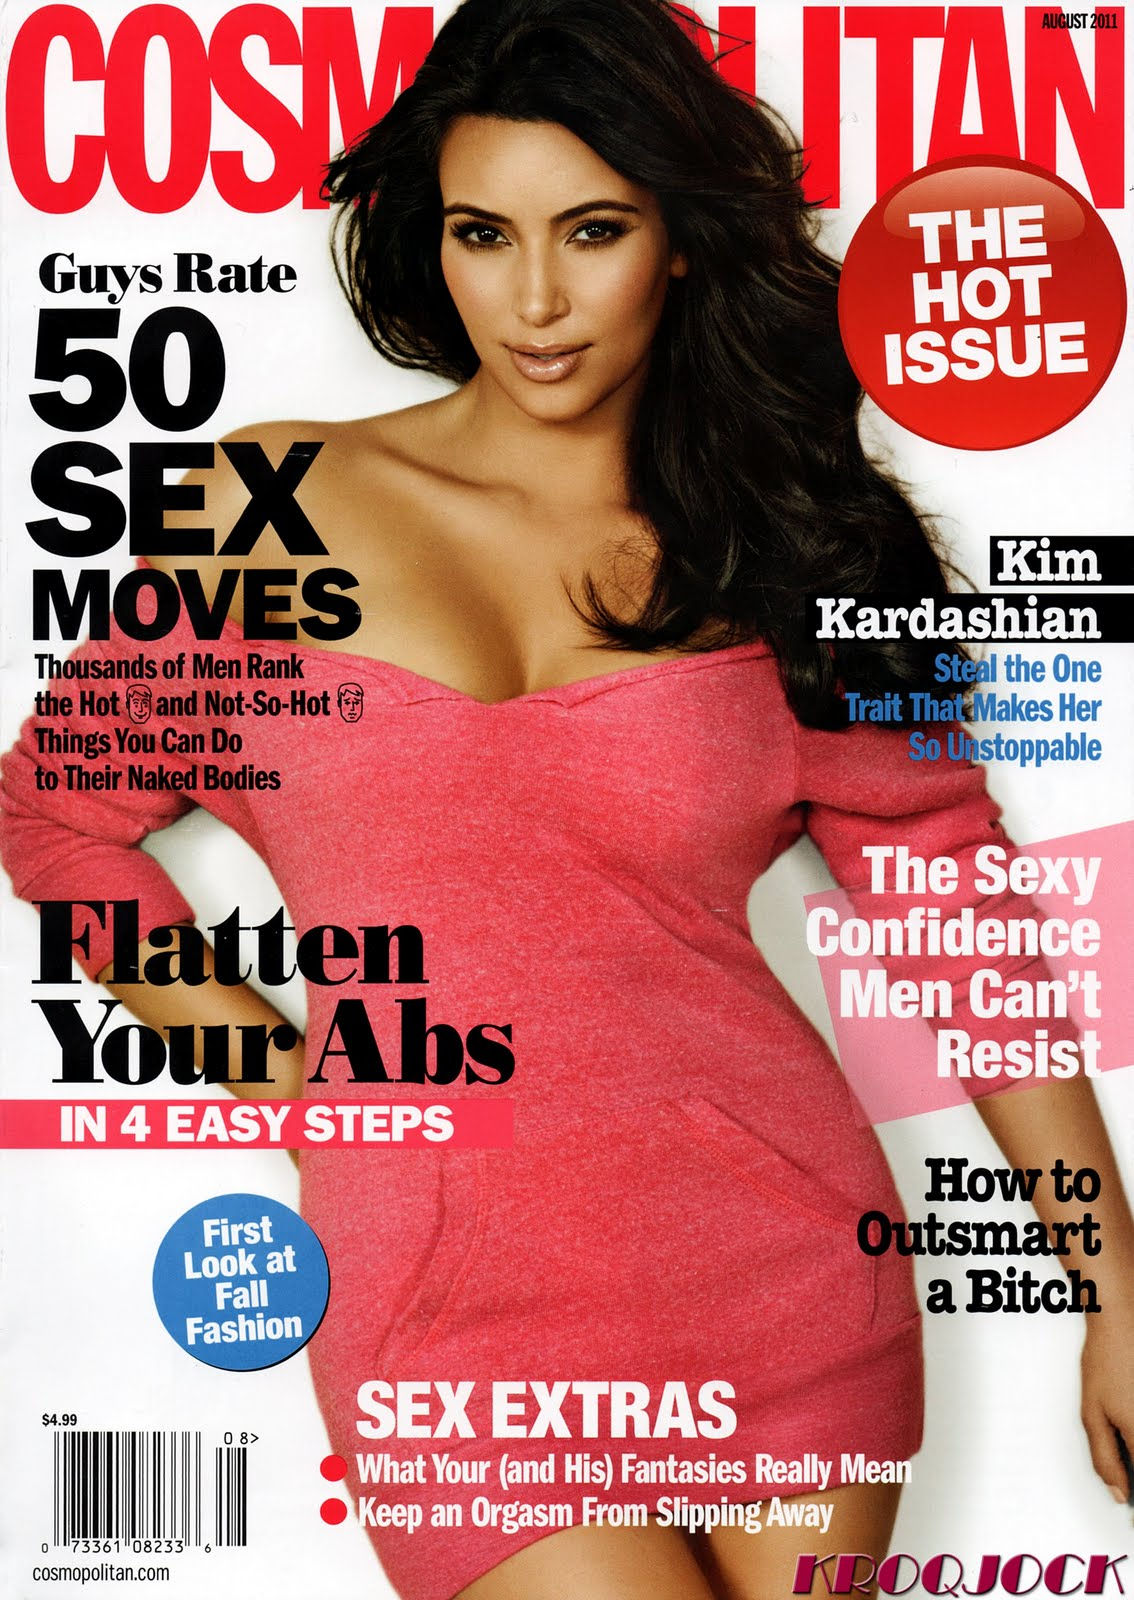 Cover girl kim kardashian on cosmopolitan magazine cover august 2011 1